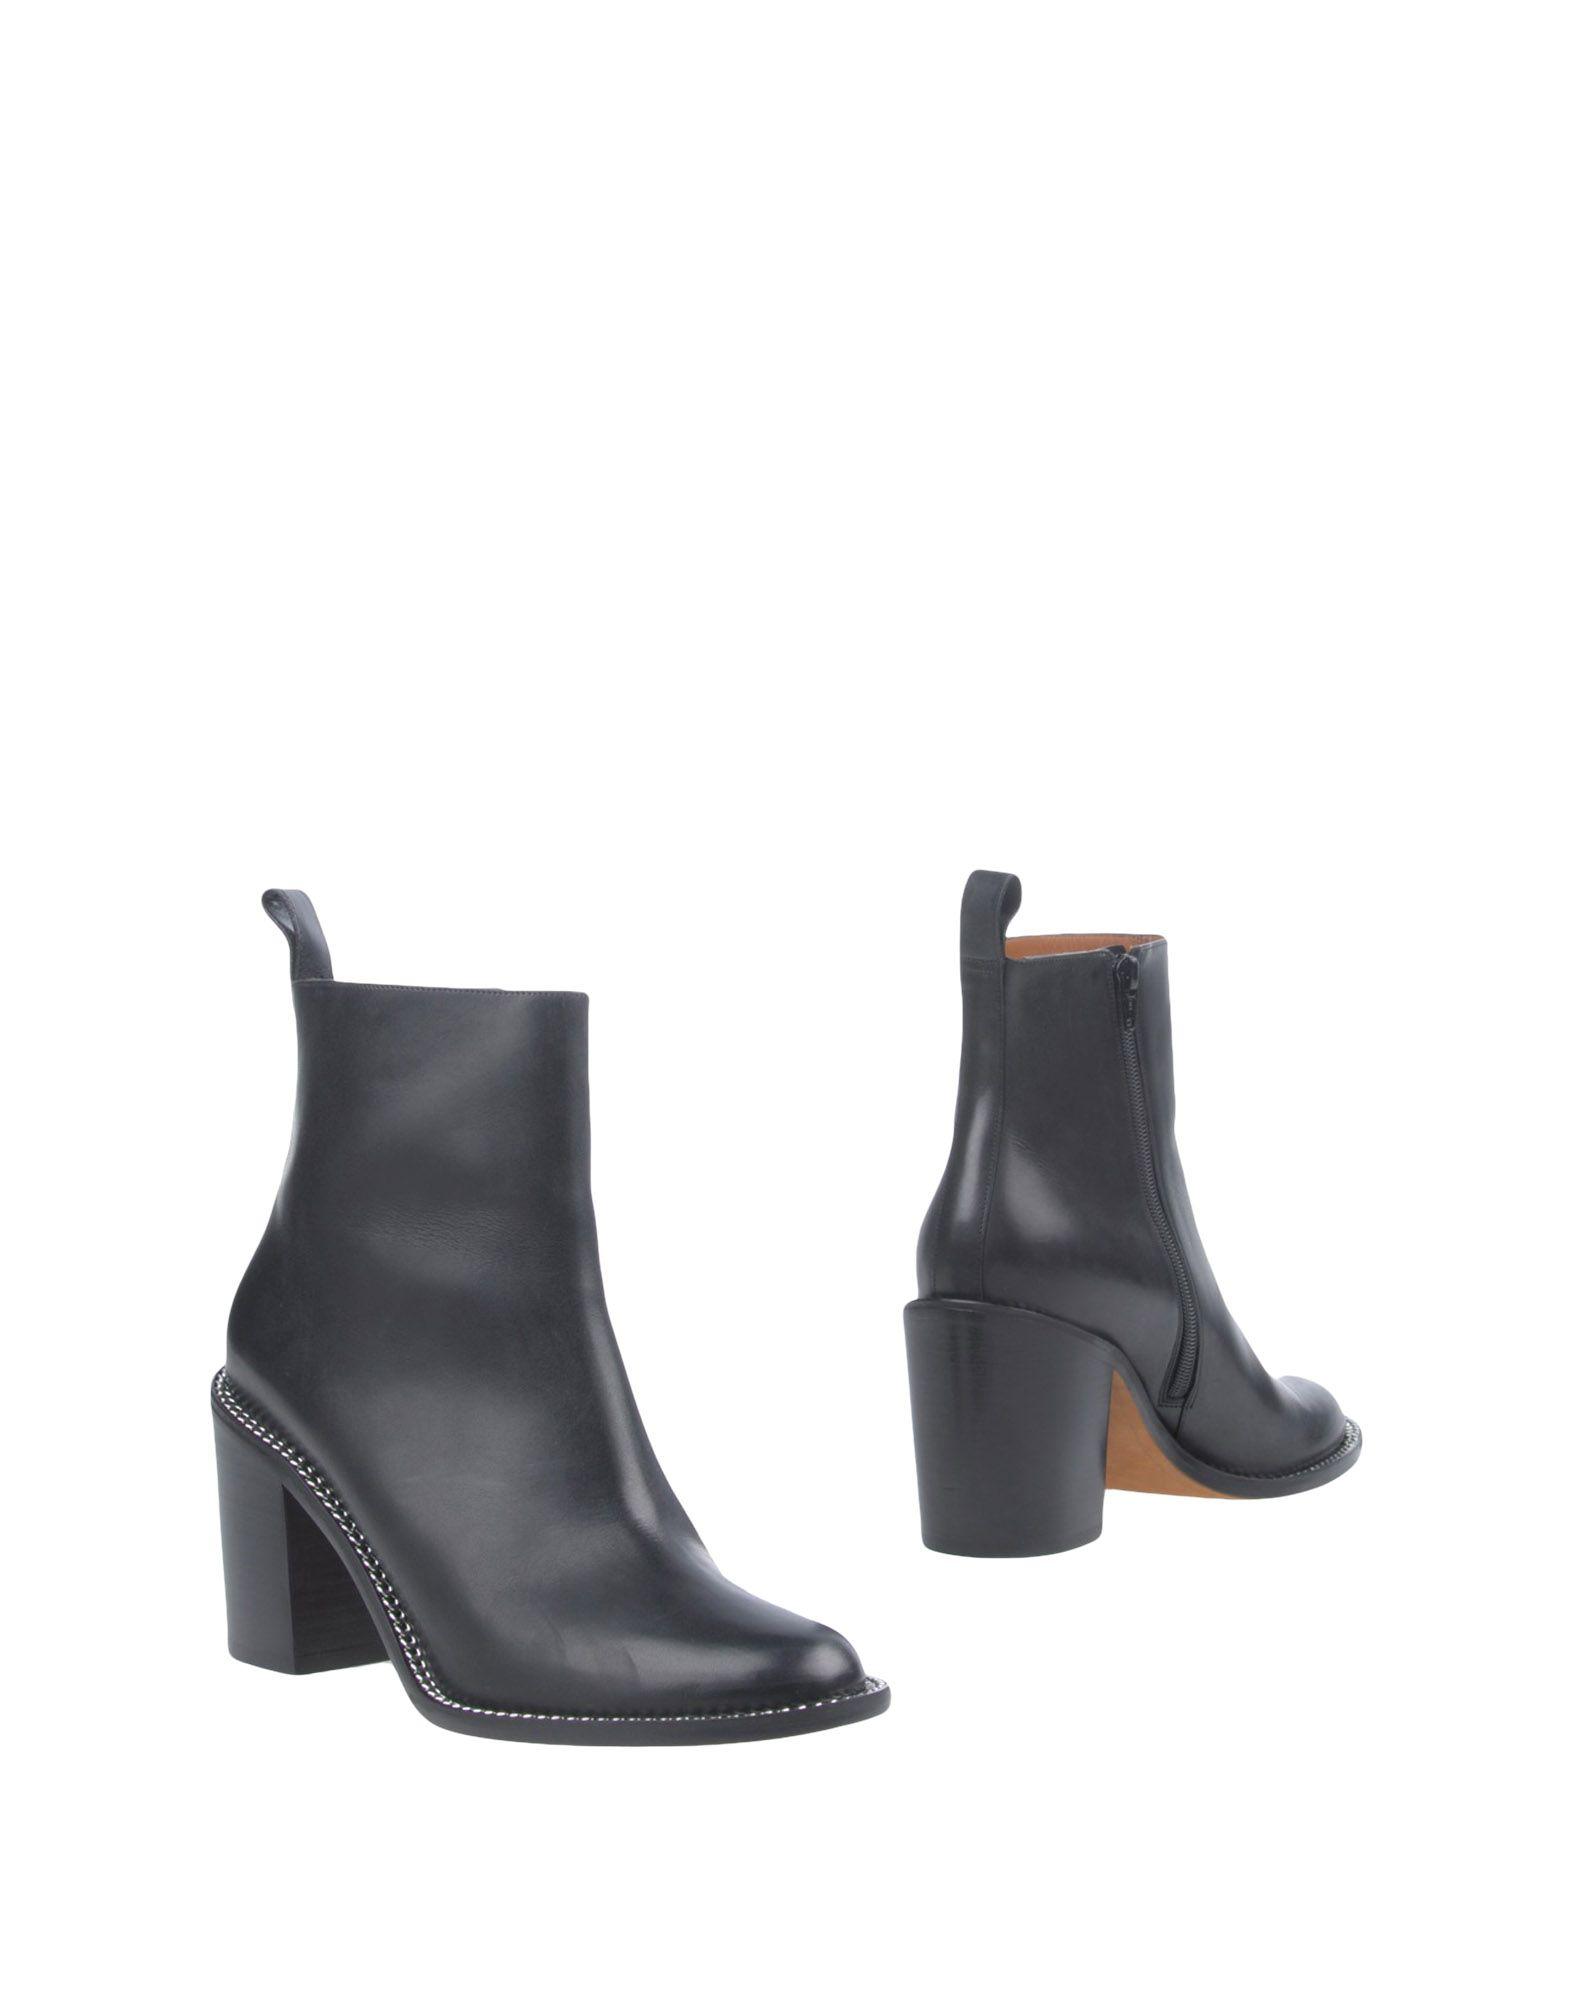 GIVENCHY Полусапоги и высокие ботинки givenchy 5ml